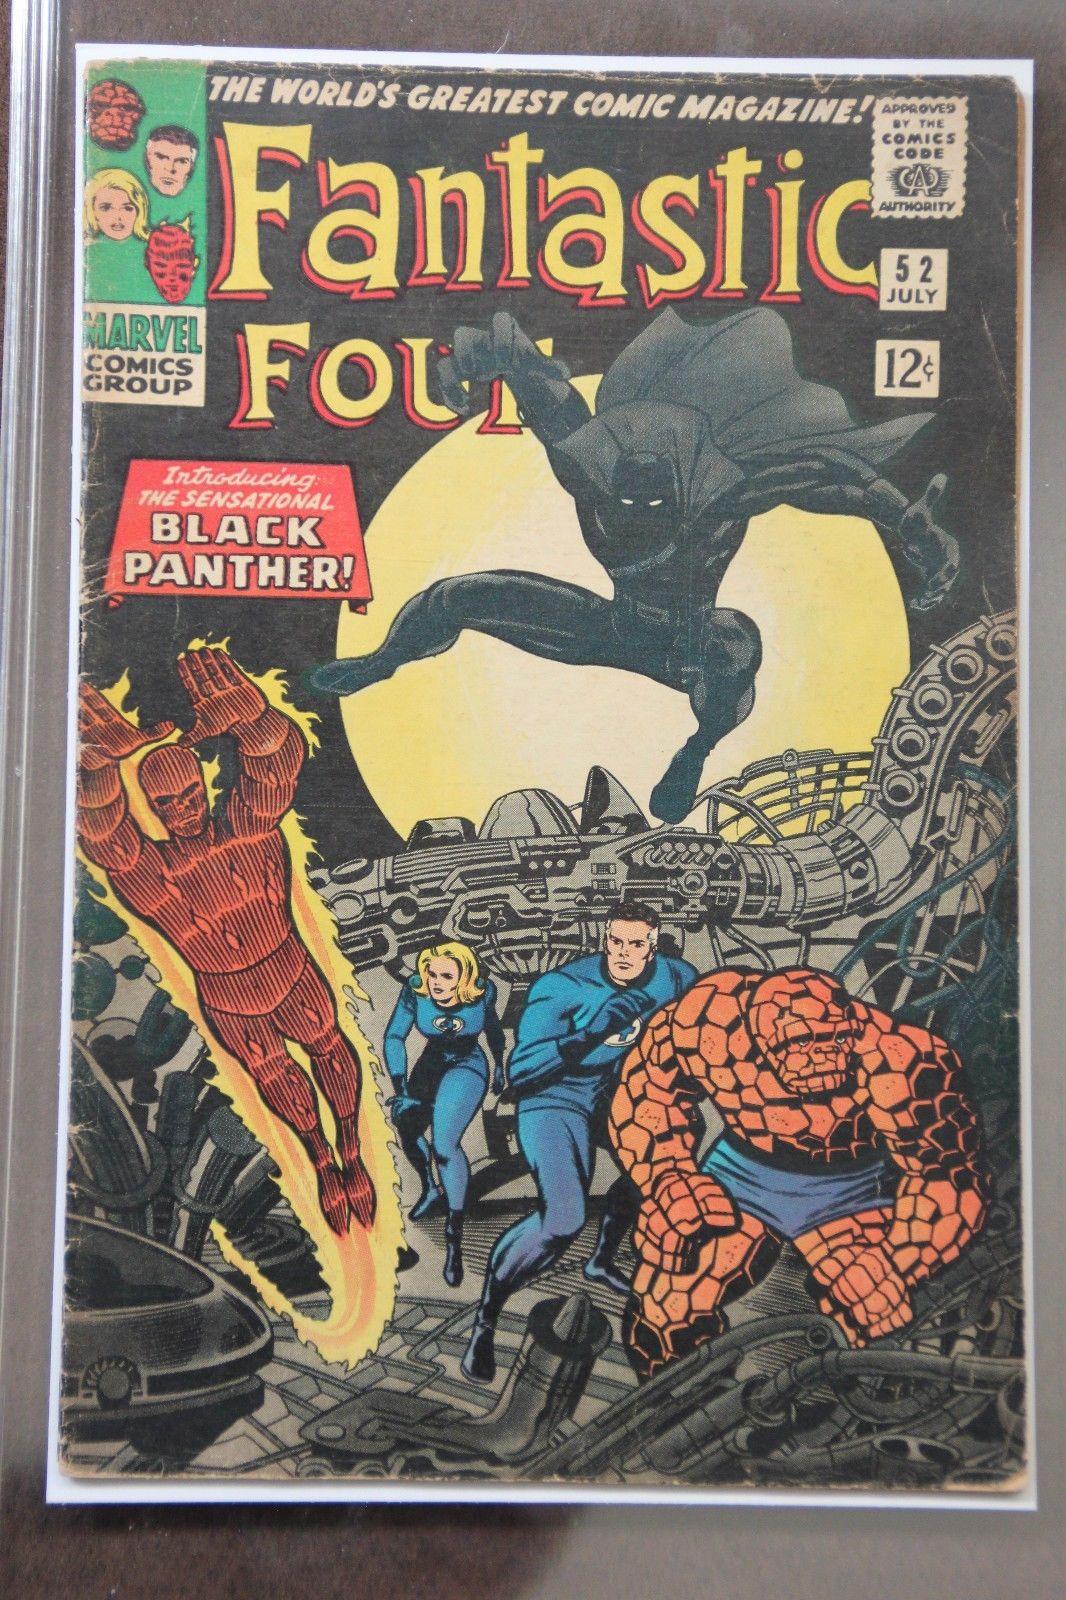 Fantastic Four #52 Marvel 1966 First App. Black Panther Affordable Key issue